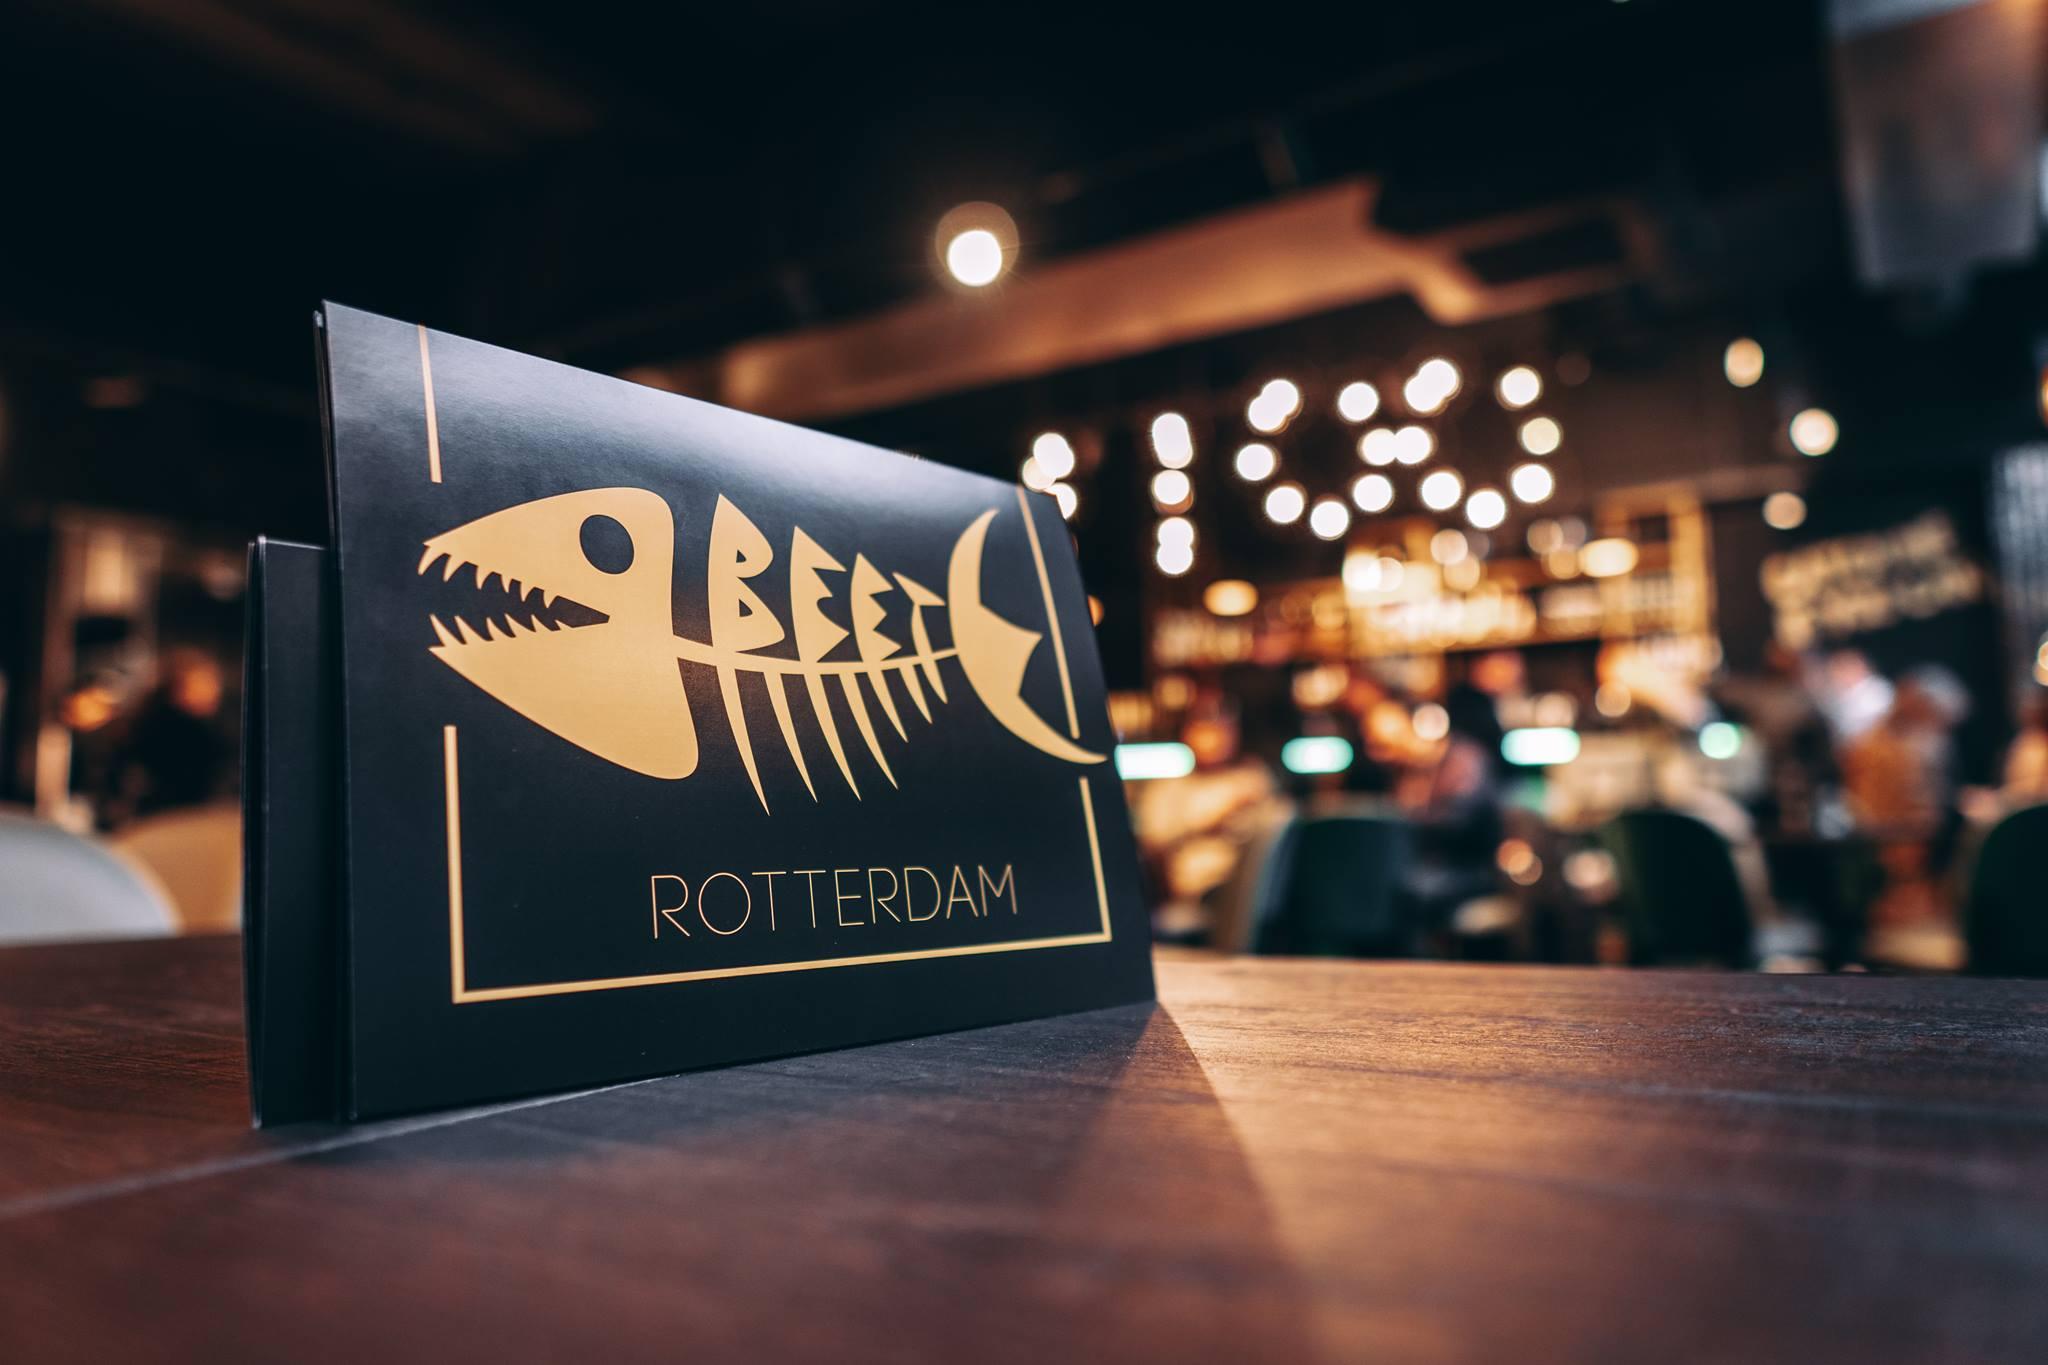 Afbeelding BEET Rotterdam - Theaterwijzer